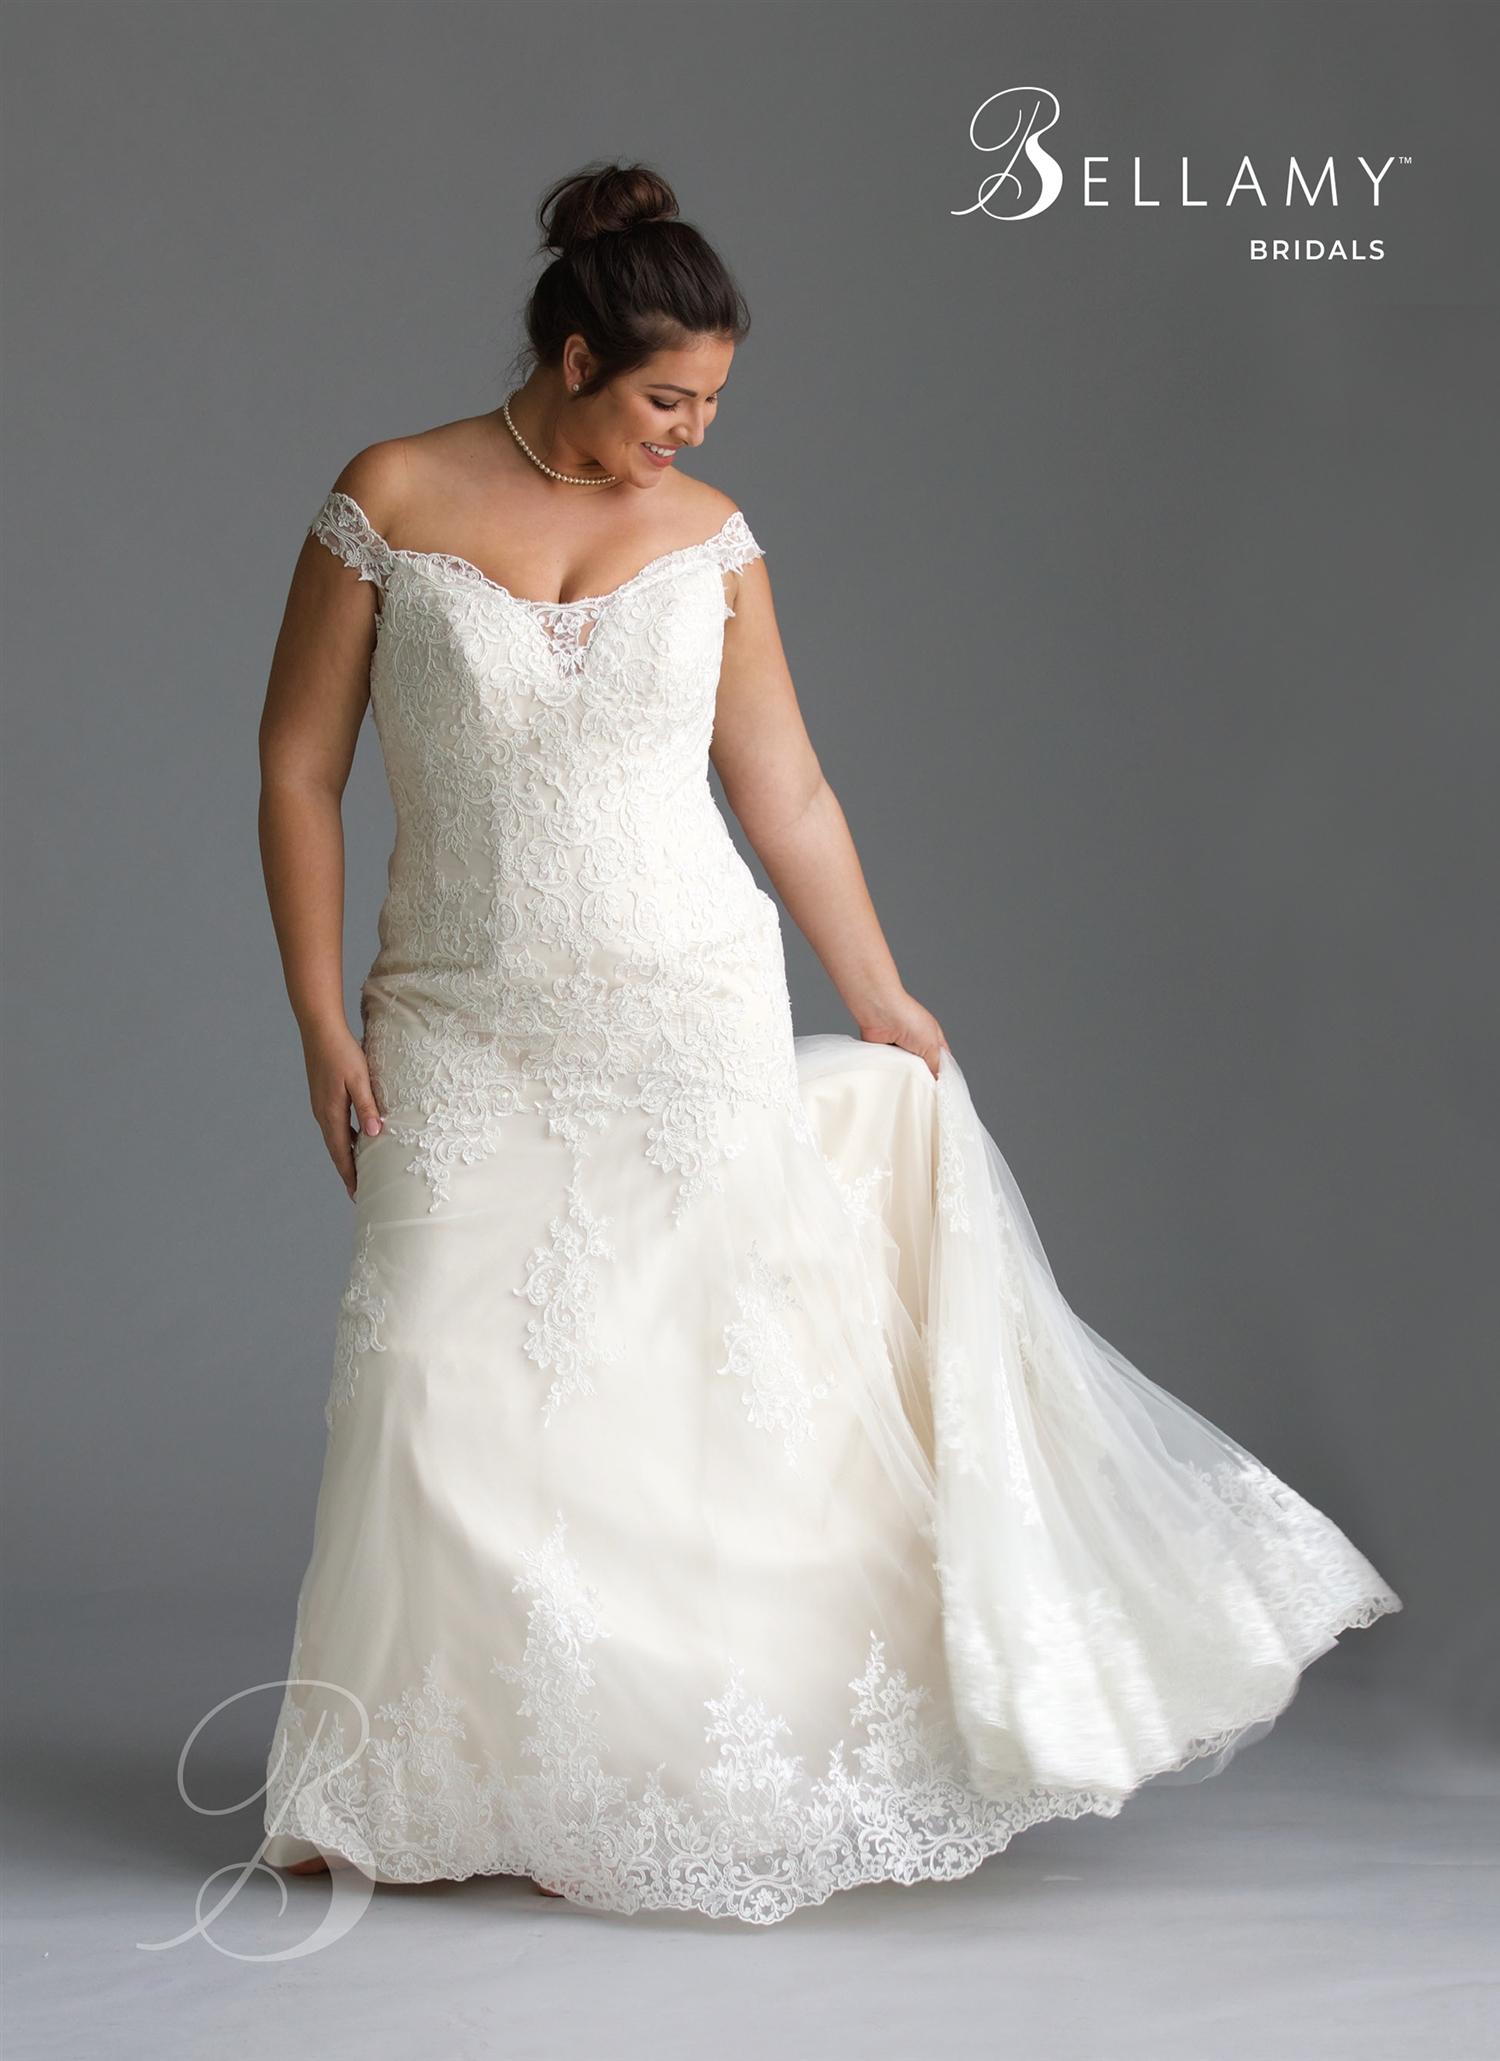 Plus Size Dress at Brilliant Bridal